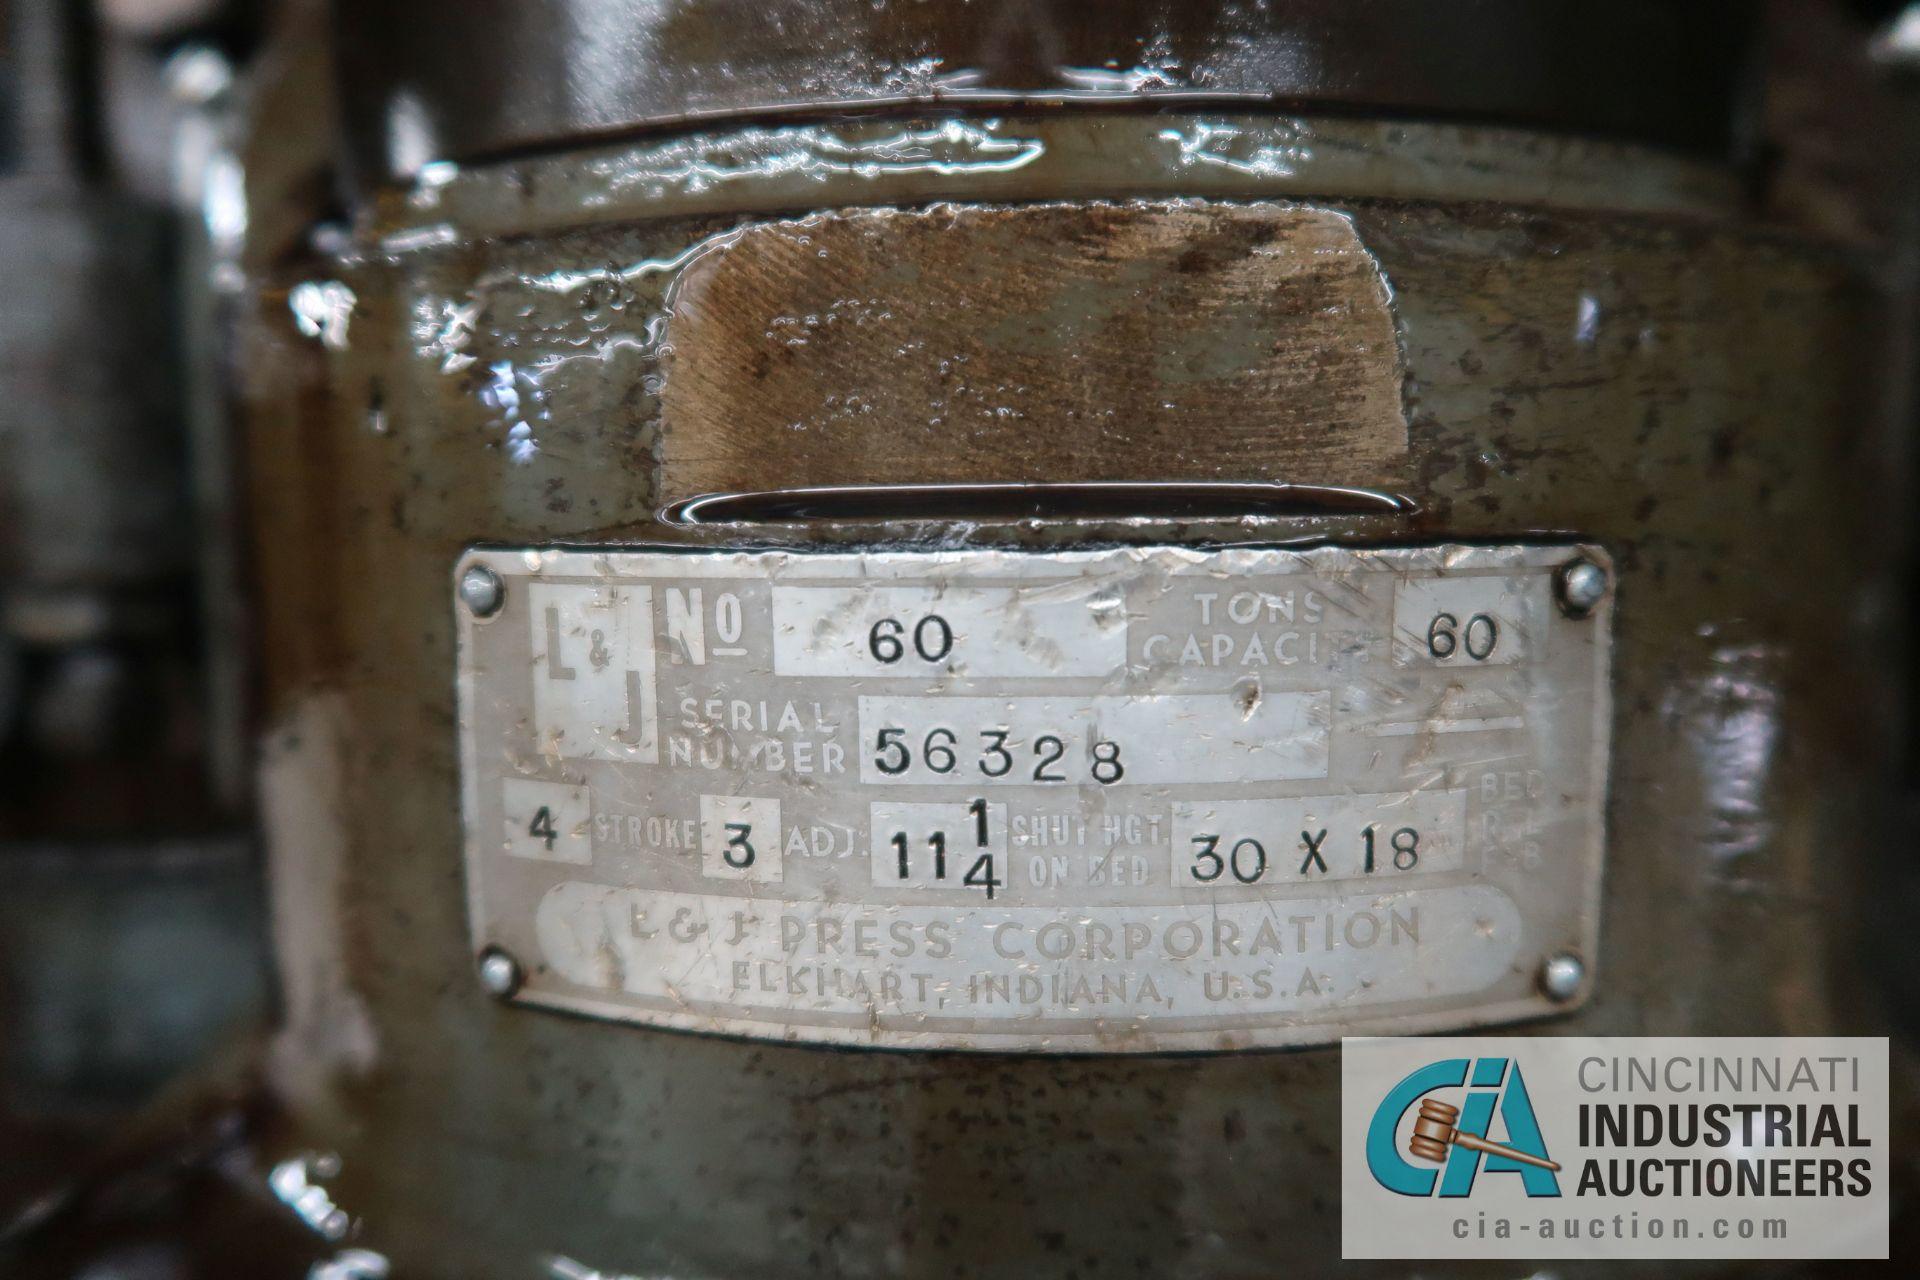 "60 TON L&J MODEL W-60 BACK GEARED OBI PRESS; S/N 56328, 4"" STROKE, 3"" ADJUST, 11-1/4"" SHUT HEIGHT ON - Image 8 of 8"